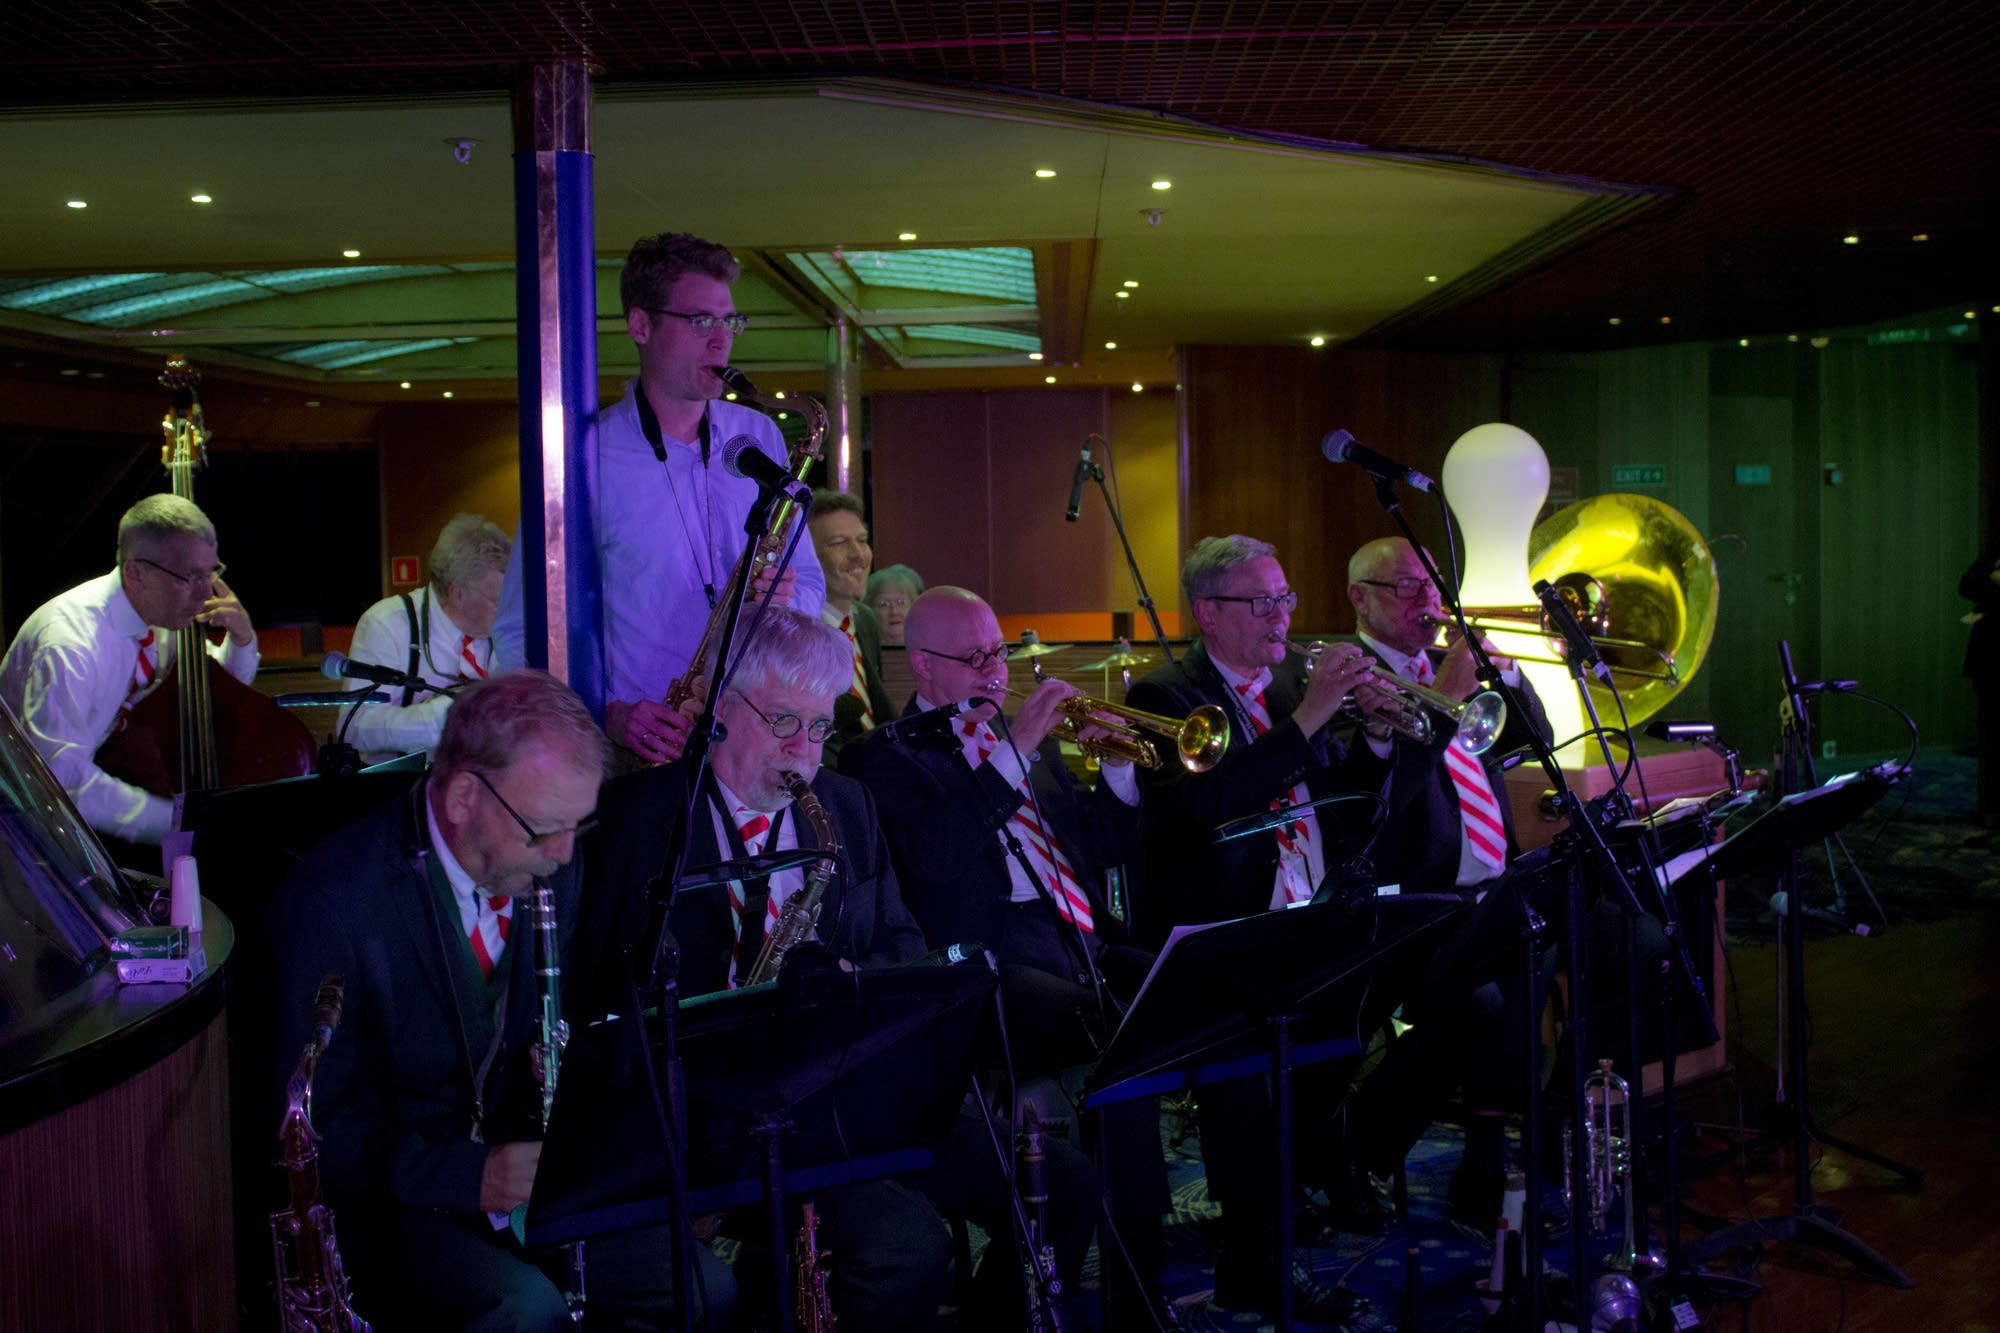 Edinburgh - 19 - The Swingin' Swedes